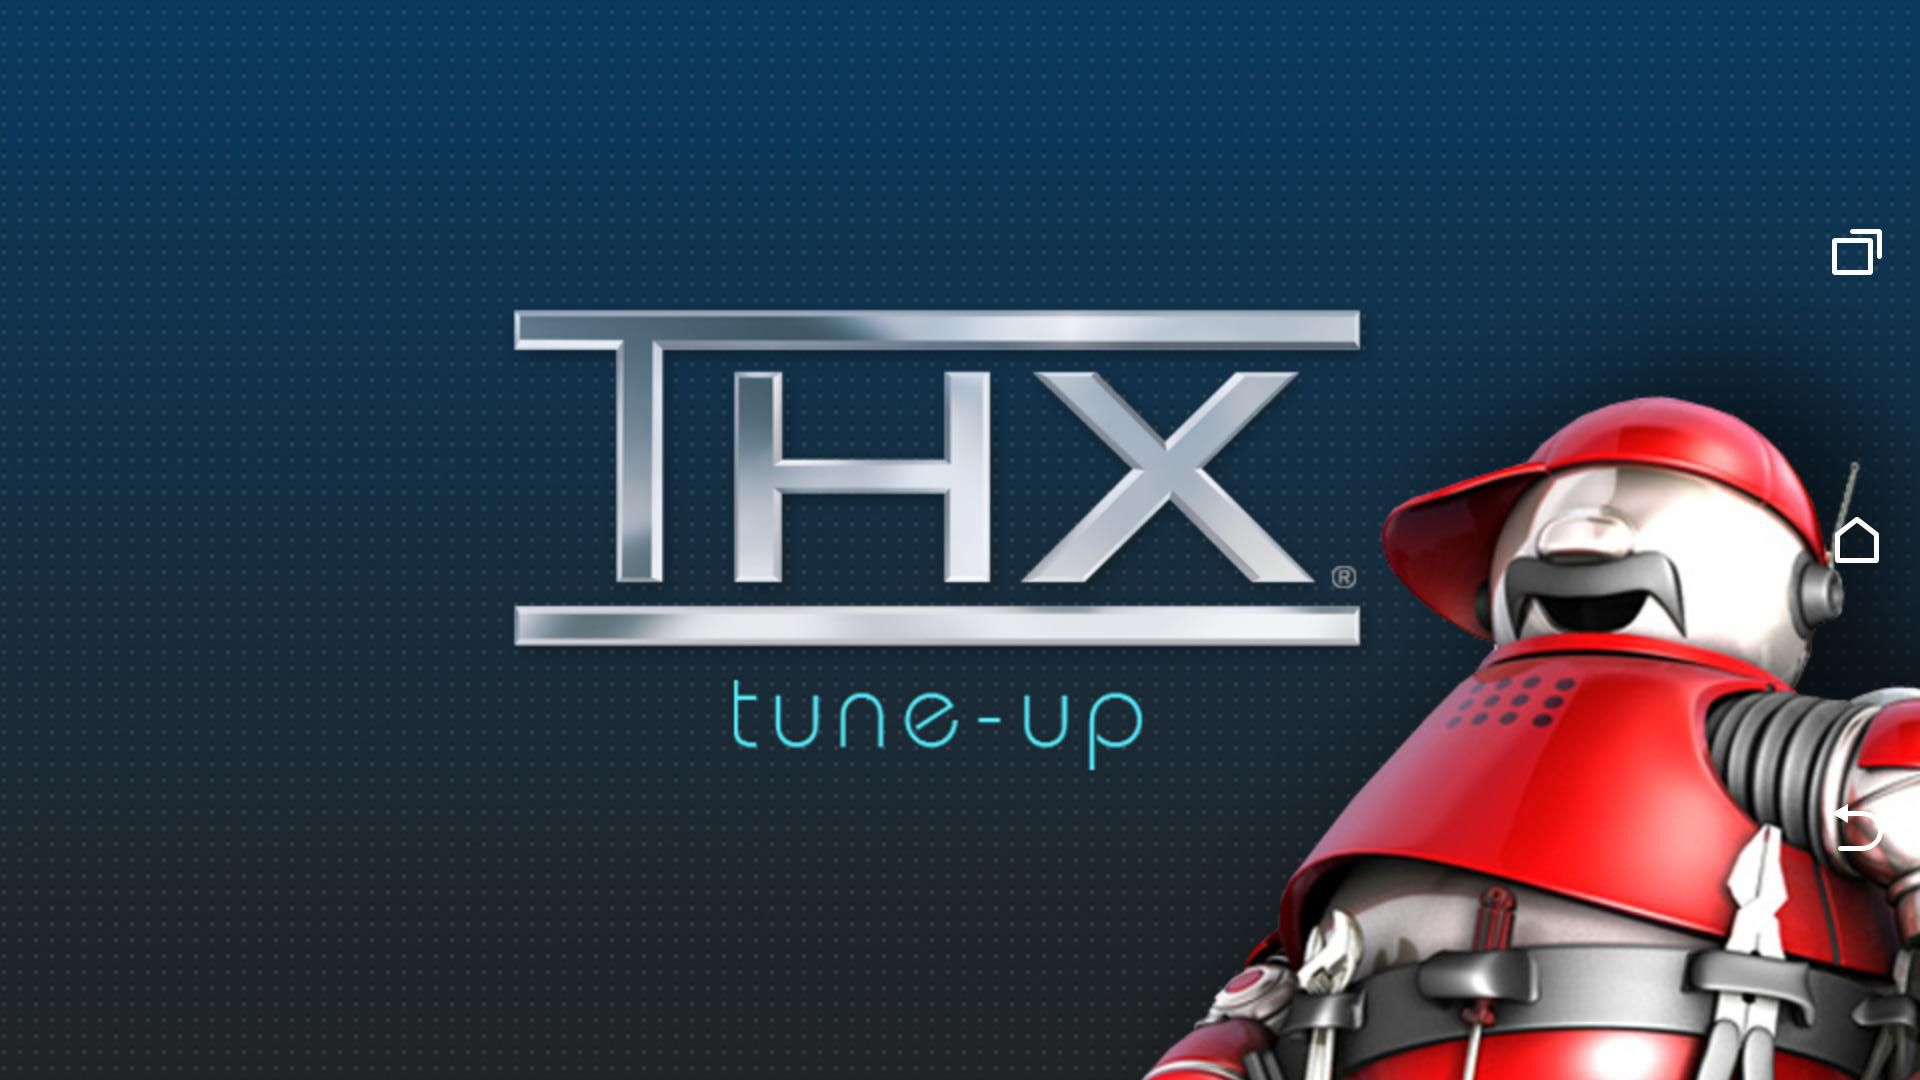 THX Home Theater Tune-Up App – Splash Page